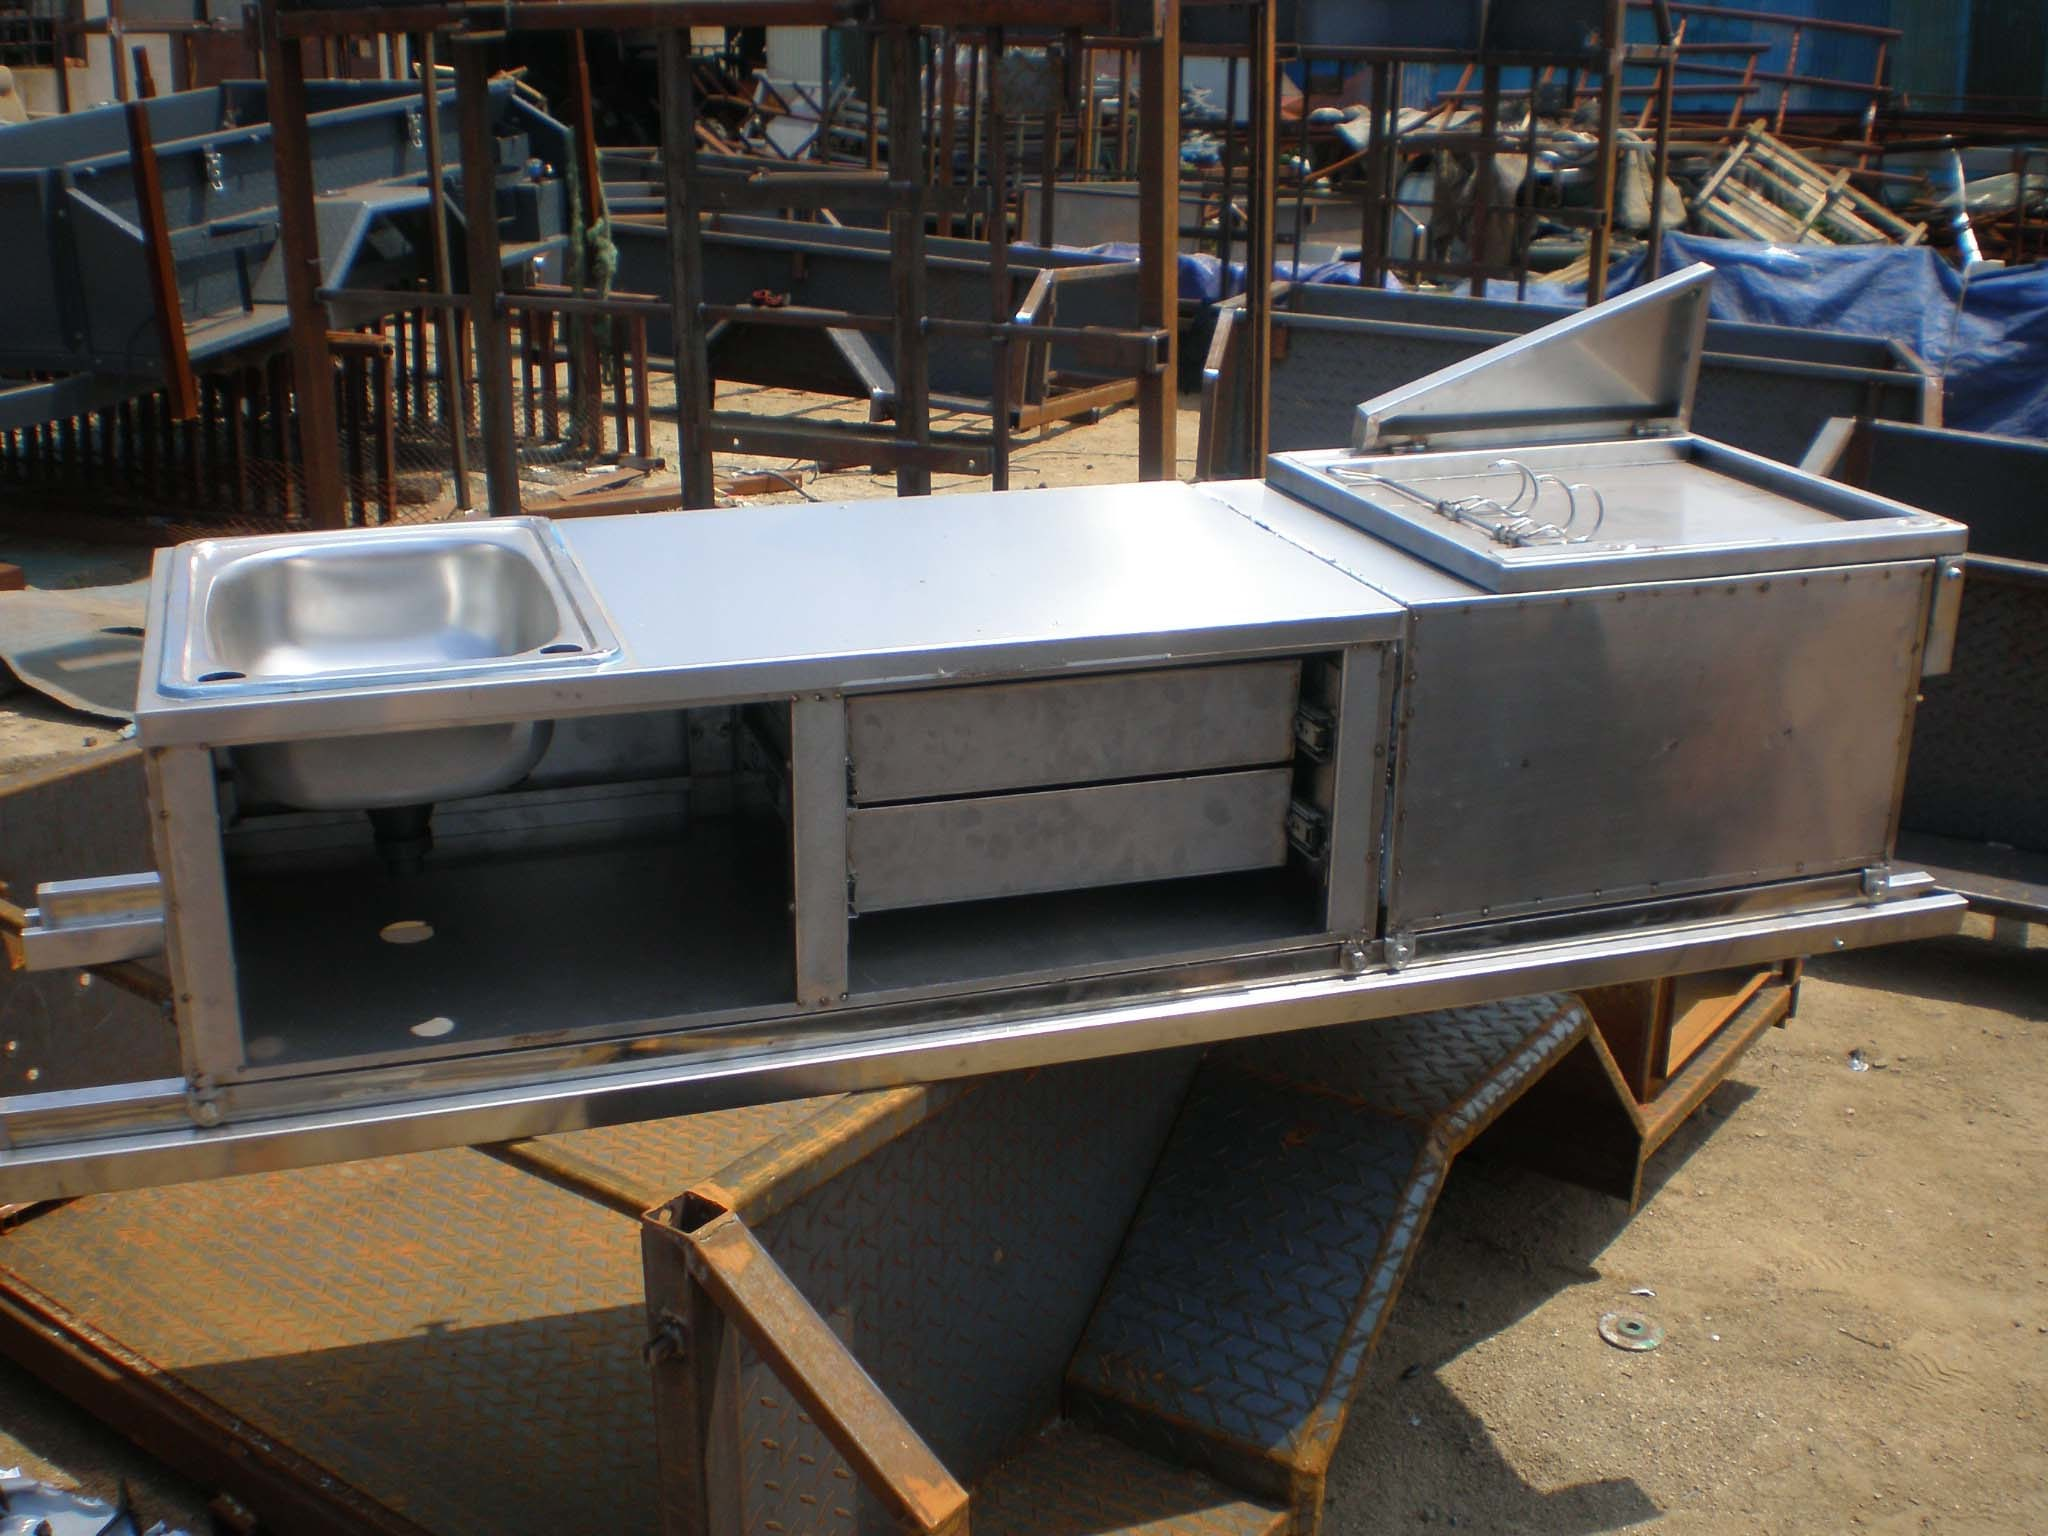 Diy Hard Floor Camper Trailer Plans Cozinha De Acampamento Inoxid 225 Vel Sk09 Do Reboque Cozinha